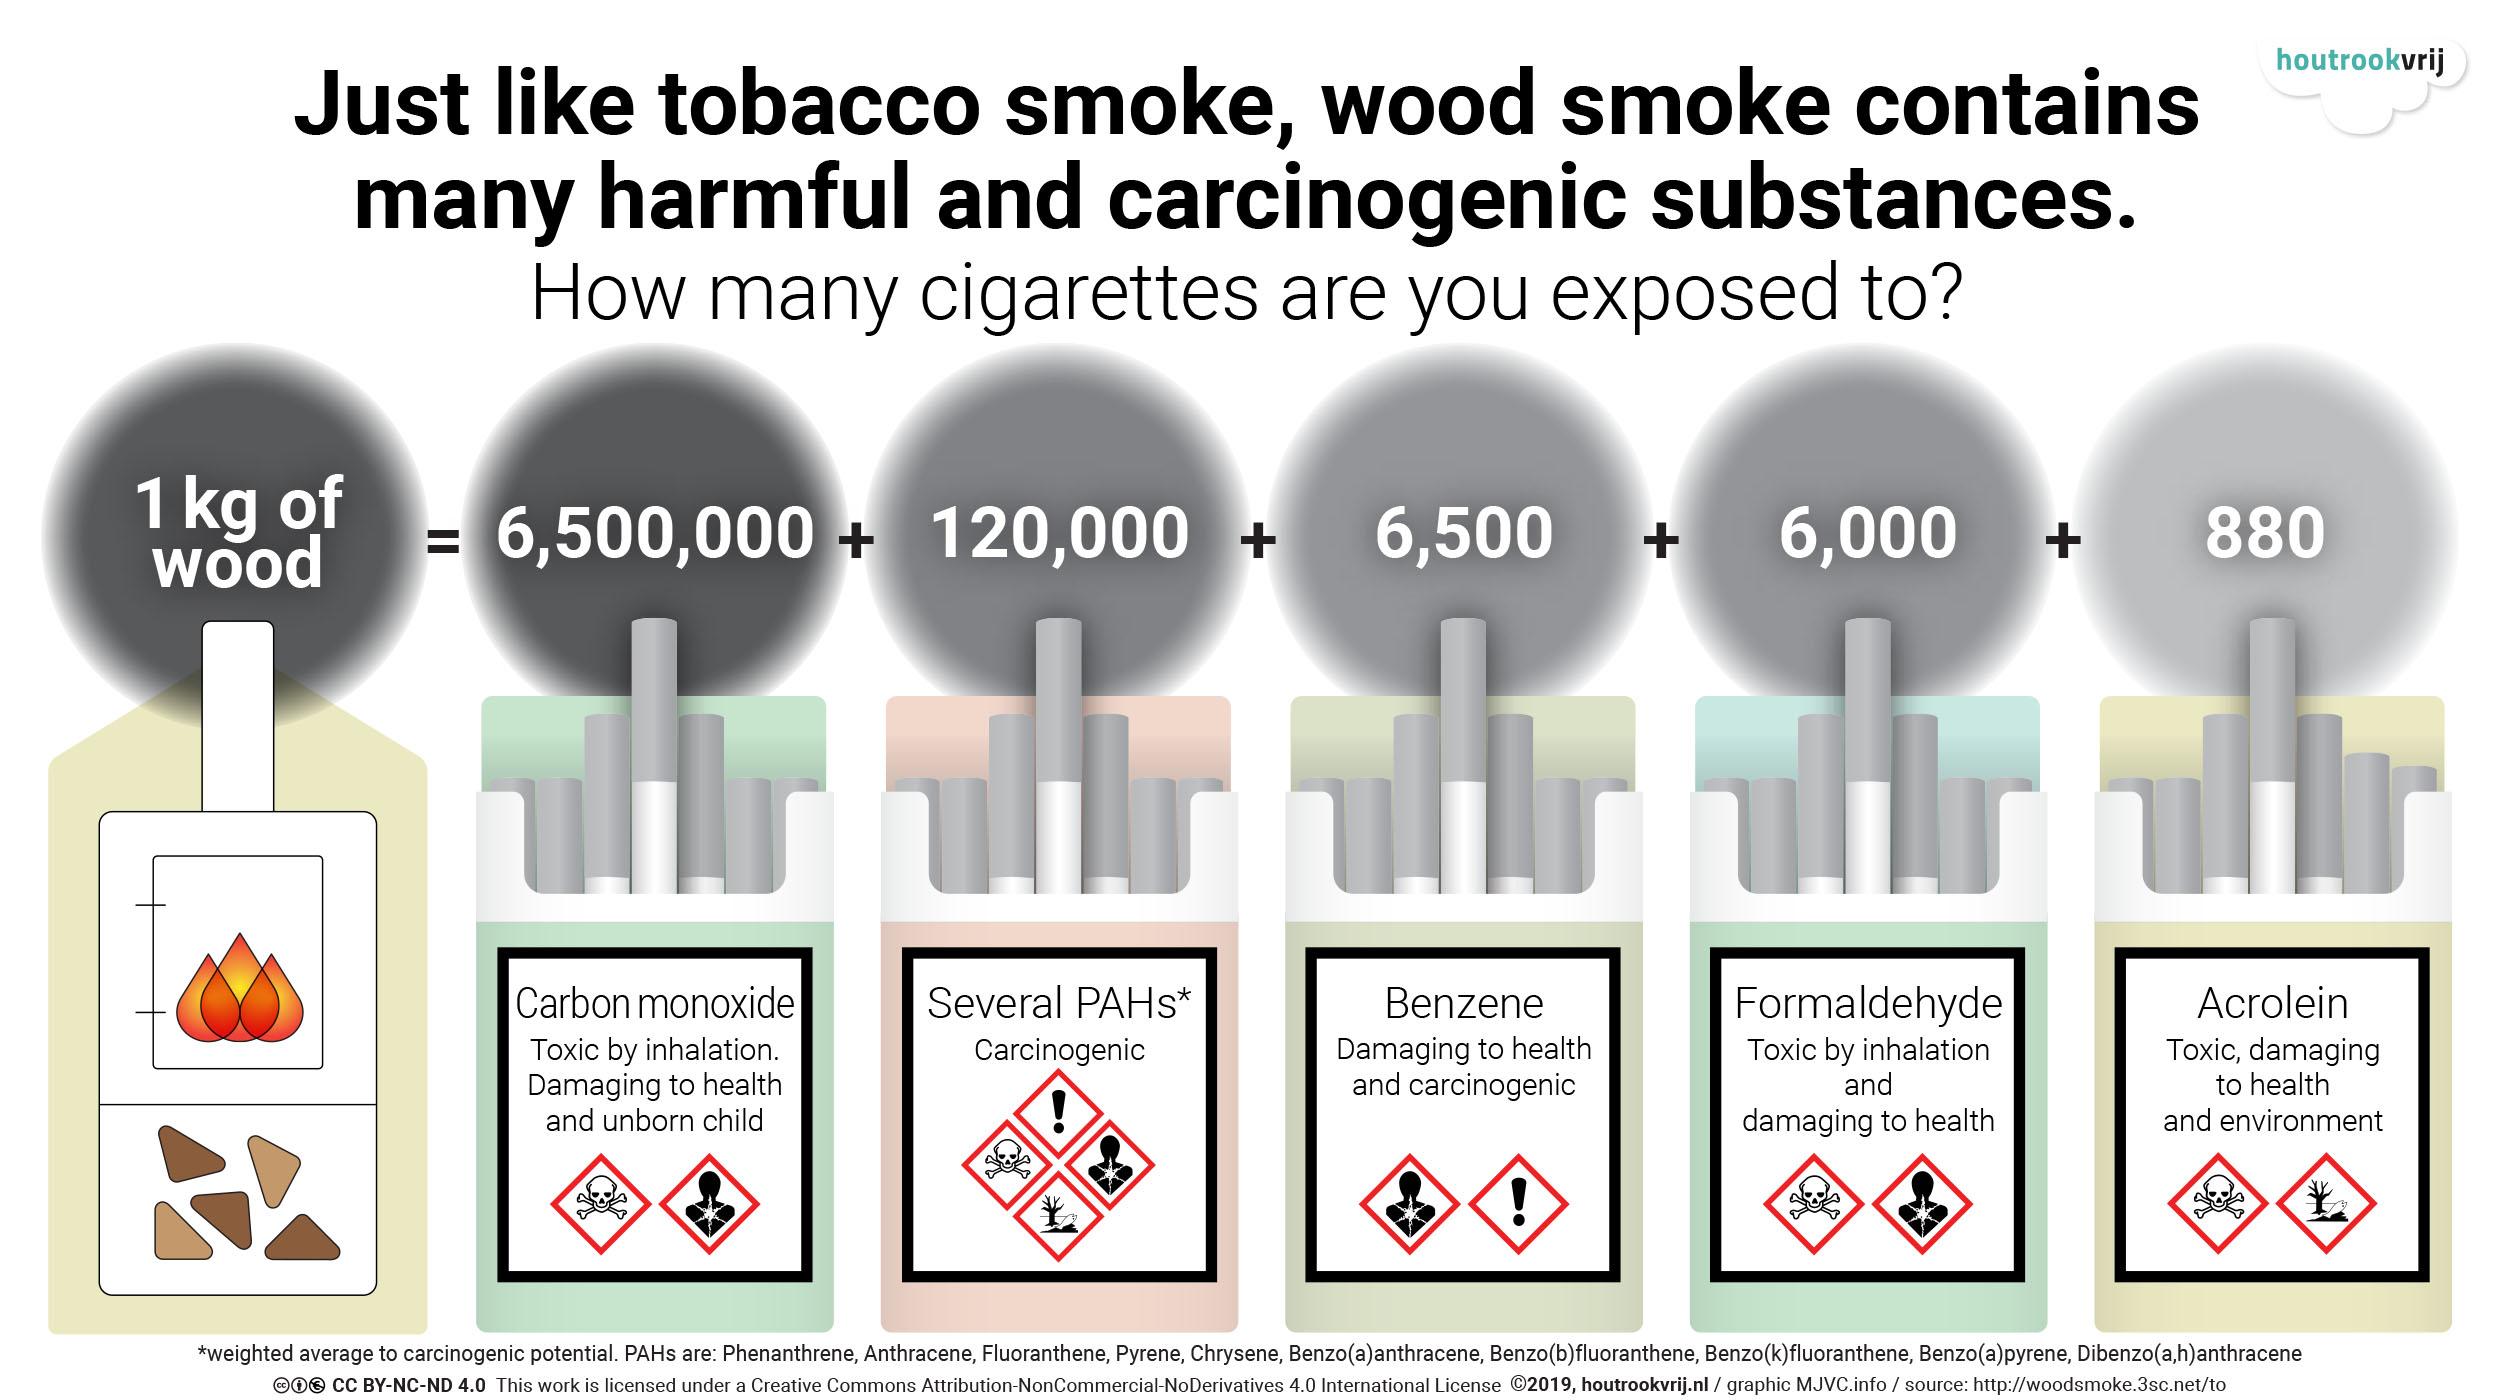 Graphic houtrook versus sigarettenrook